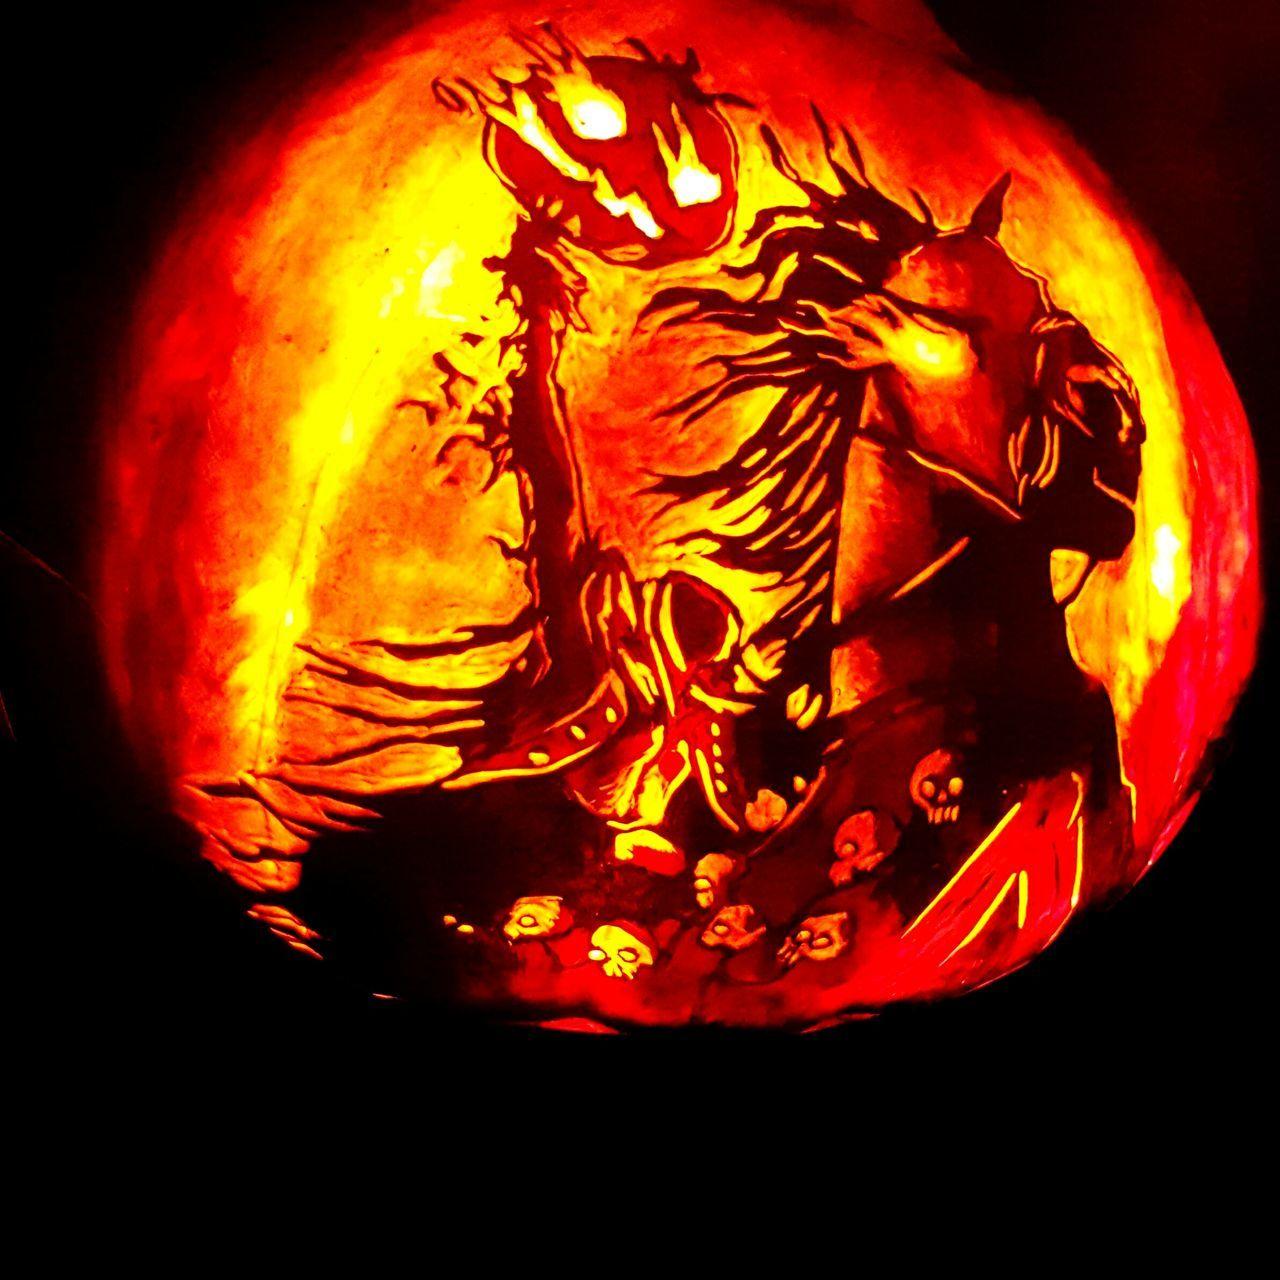 Roger Williams Park Jackolantern Spectacular Pumpkins The Headless Man